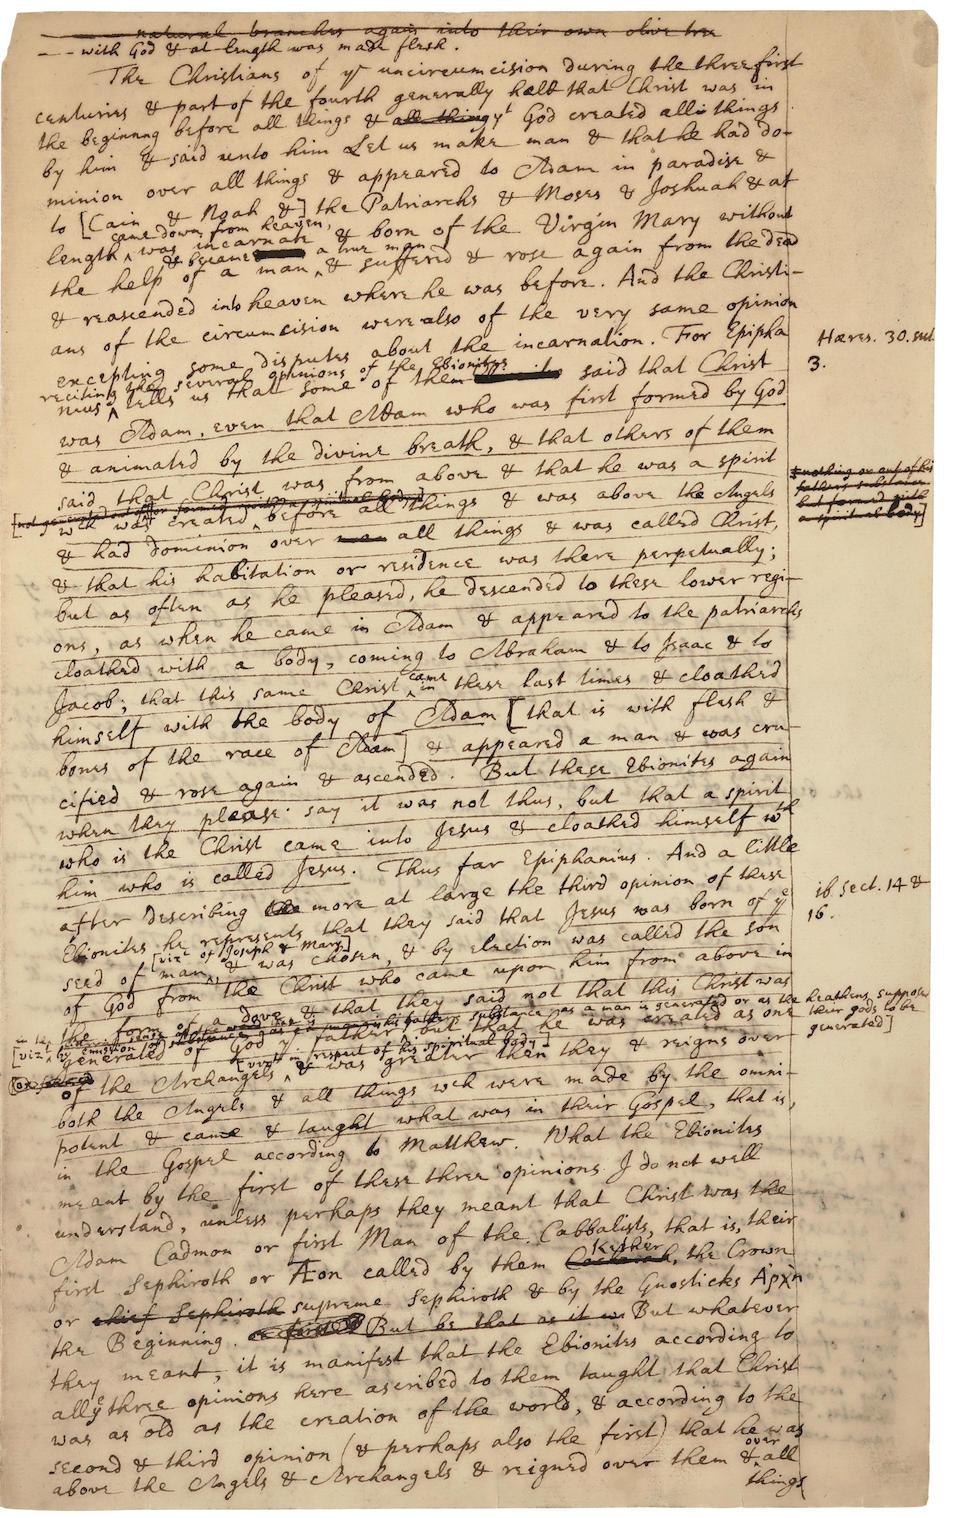 NEWTON, ISAAC. 1642-1726/7. Autograph manuscript in English, exploring the nature of God,